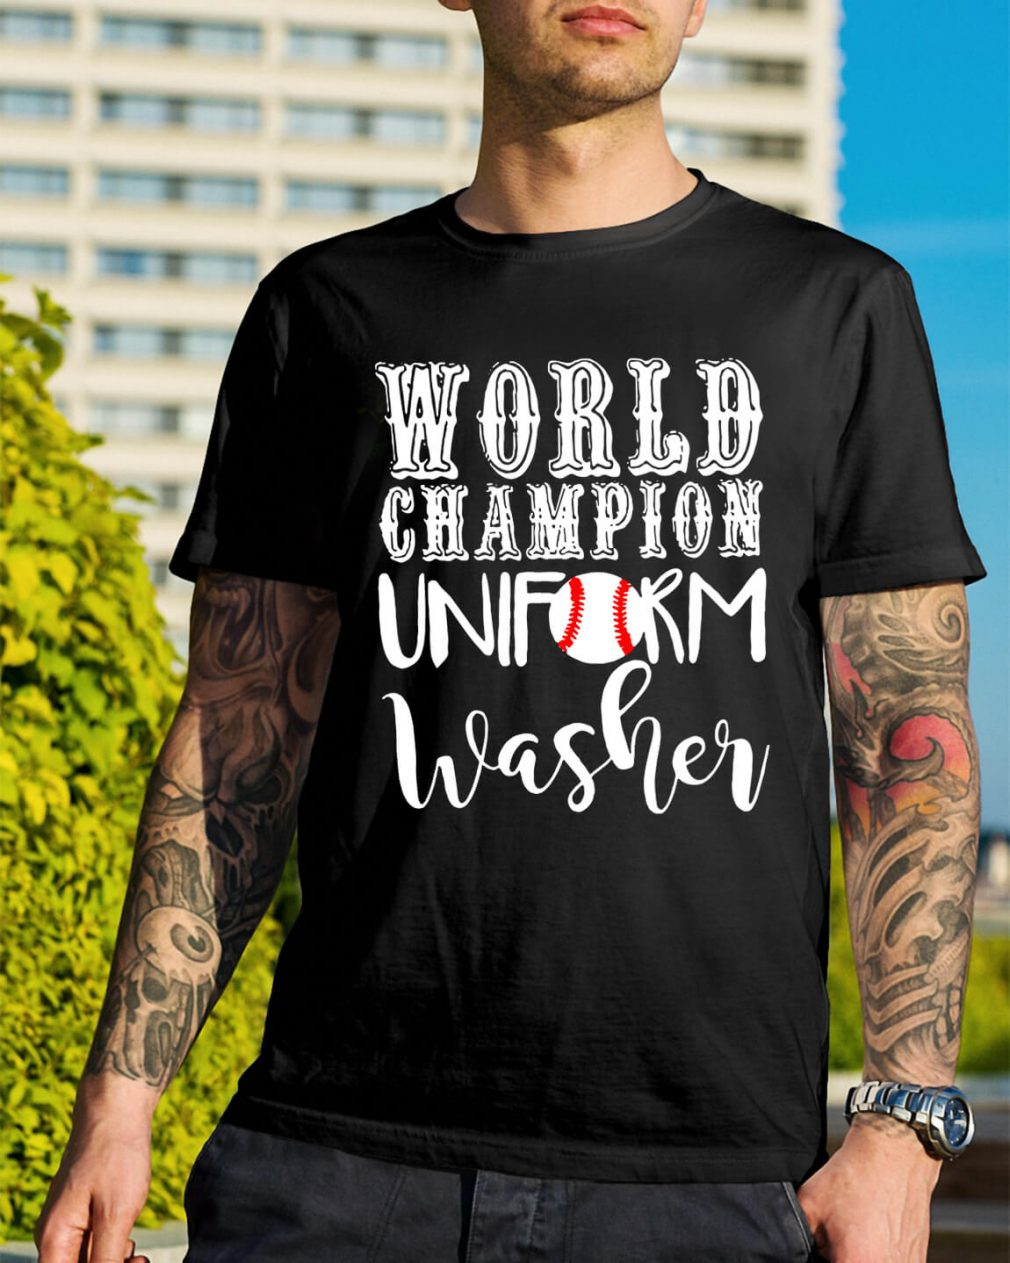 Baseball world champion uniform washer shirt